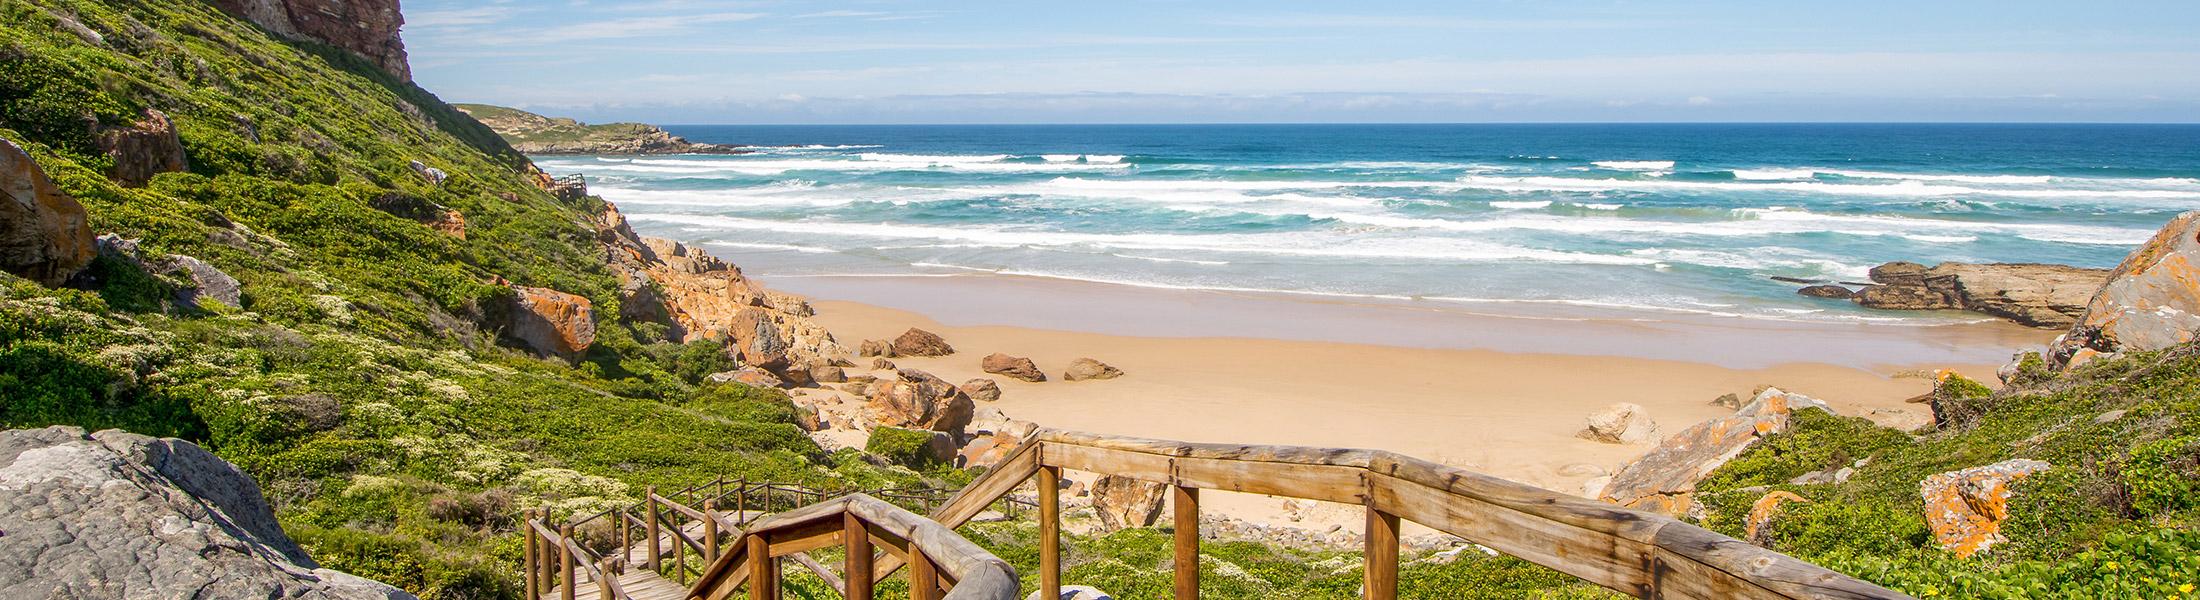 Beach at Robberg Africa